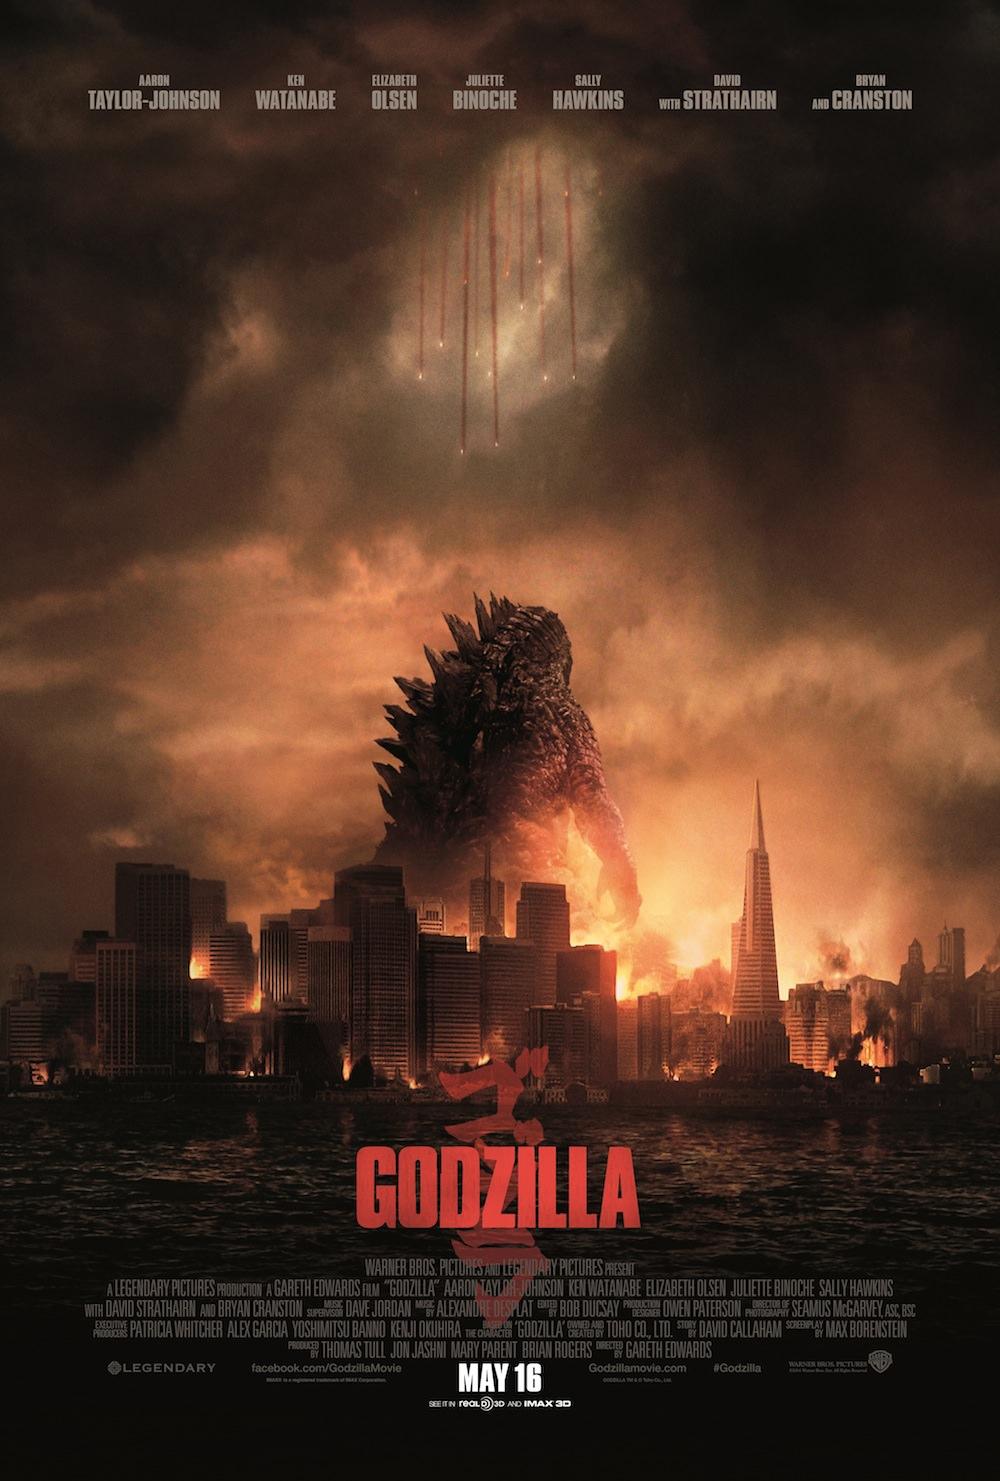 Godzilla edwards